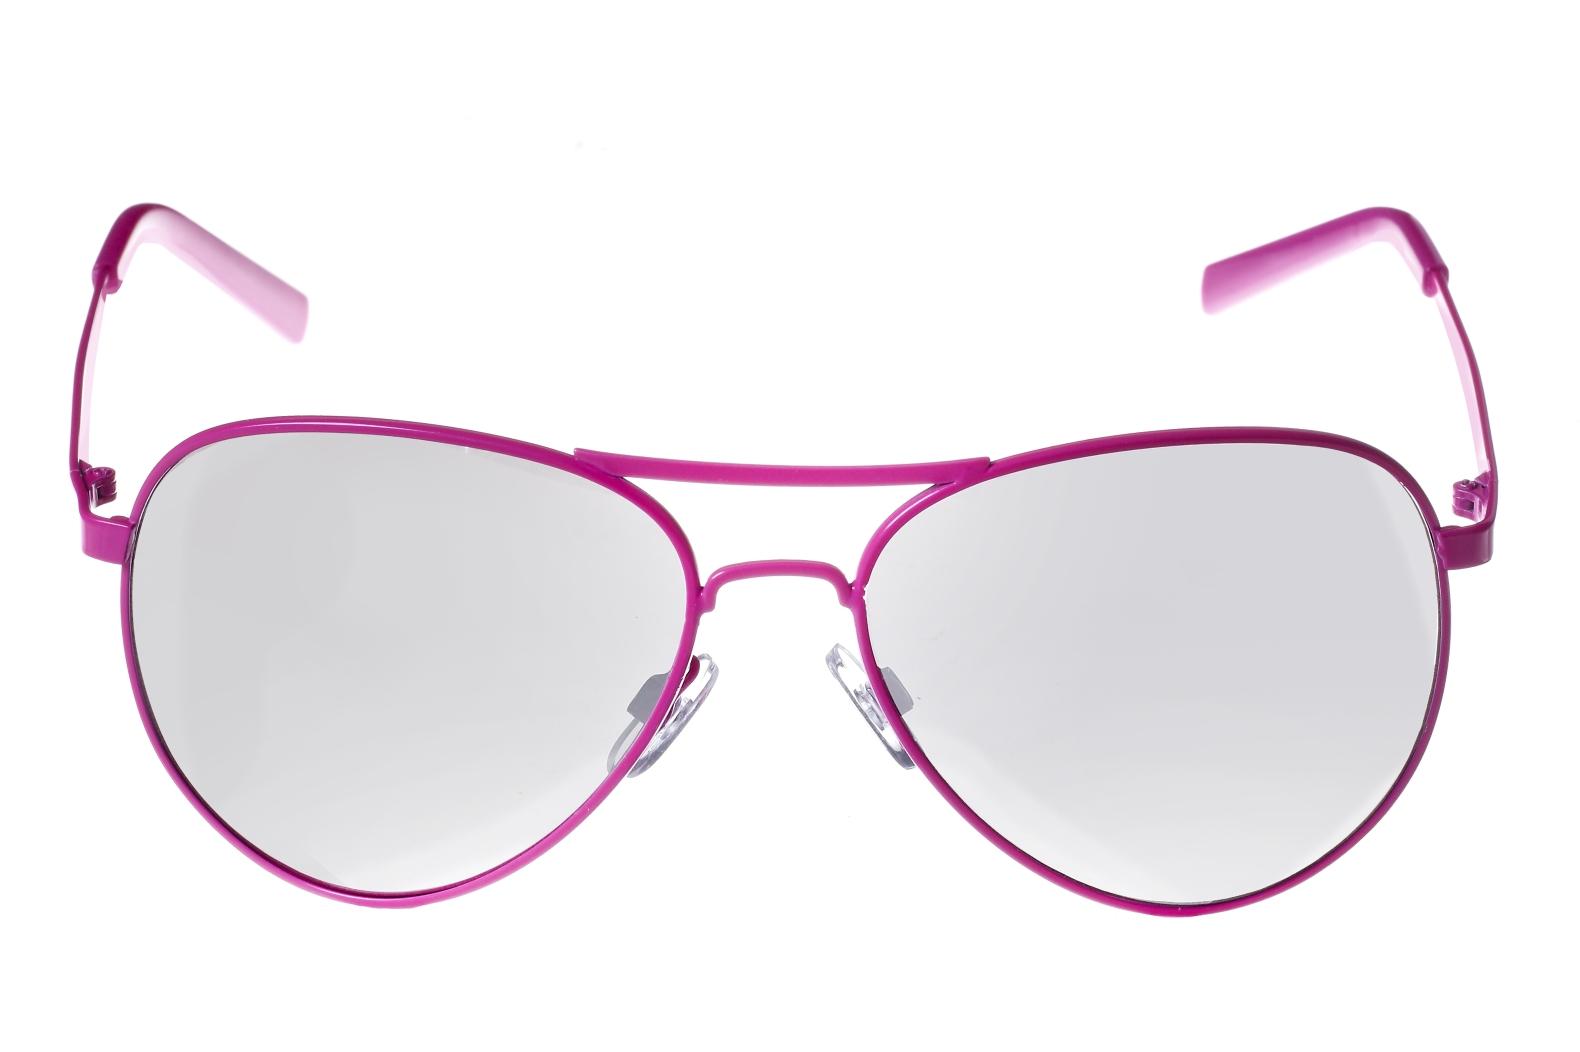 Pink Aviator sunglasses _8, 9.99 Euro, 16.90 CHF, 39.90 PLN